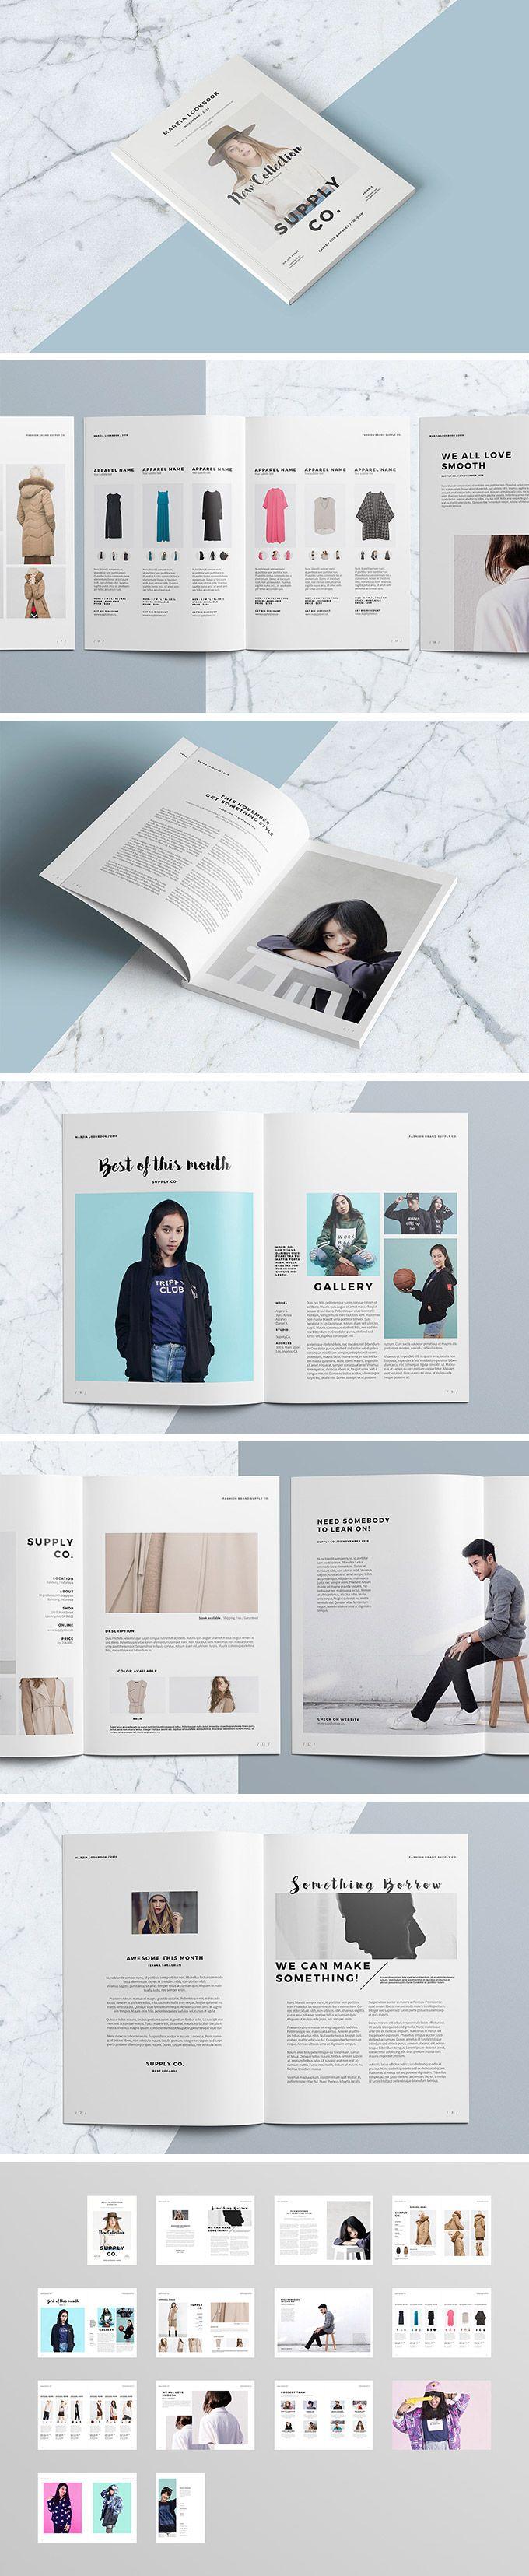 InDesign Lookbook Template - download freebie by PixelBuddha